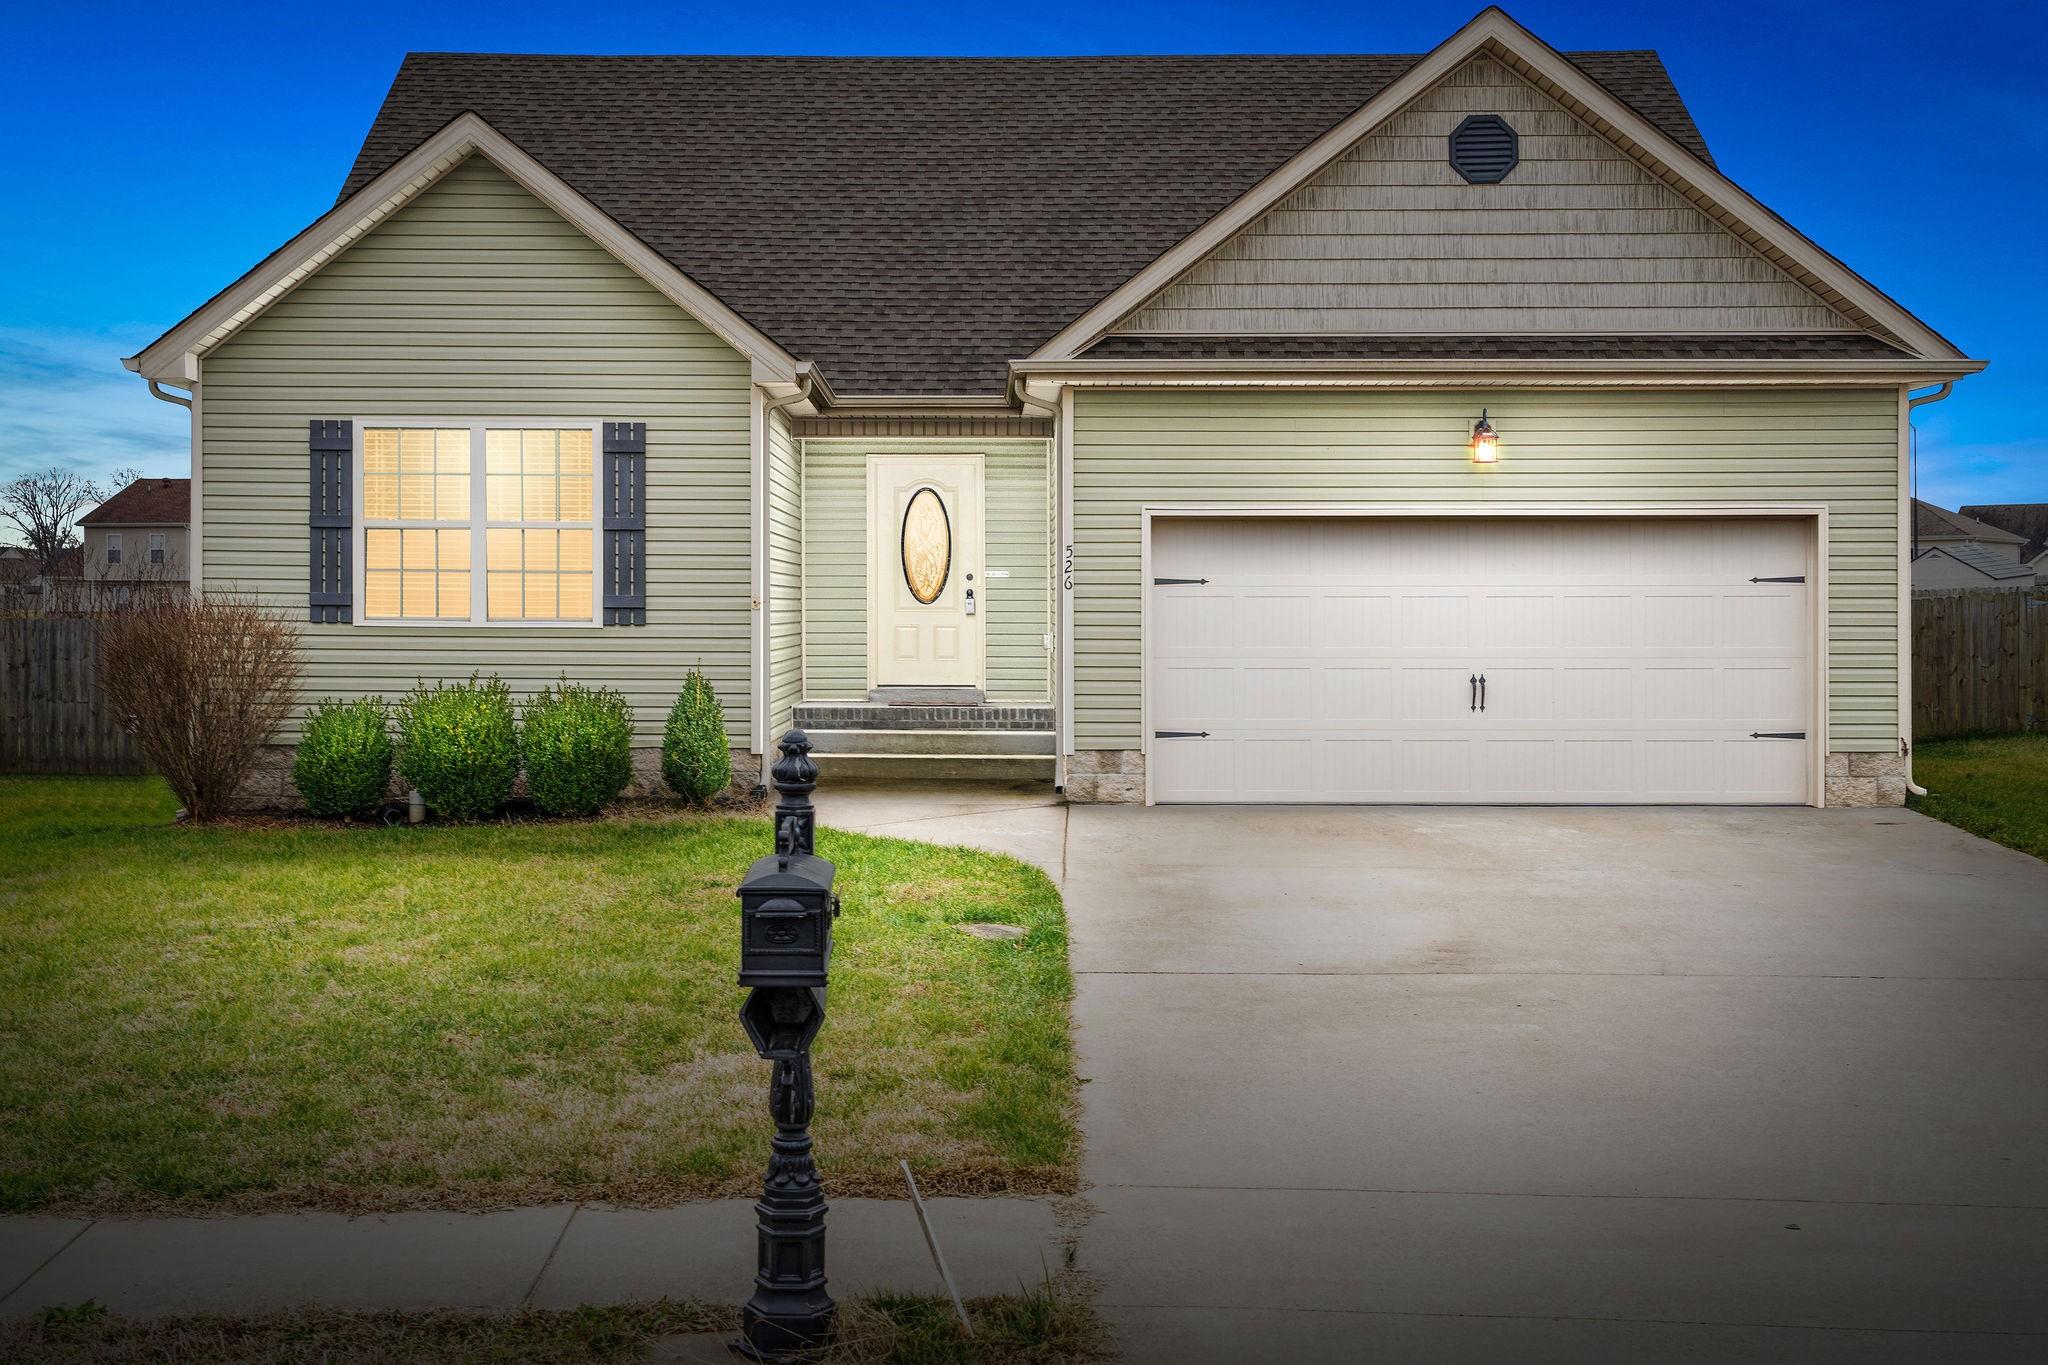 526 Falkland Cir Property Photo - Clarksville, TN real estate listing